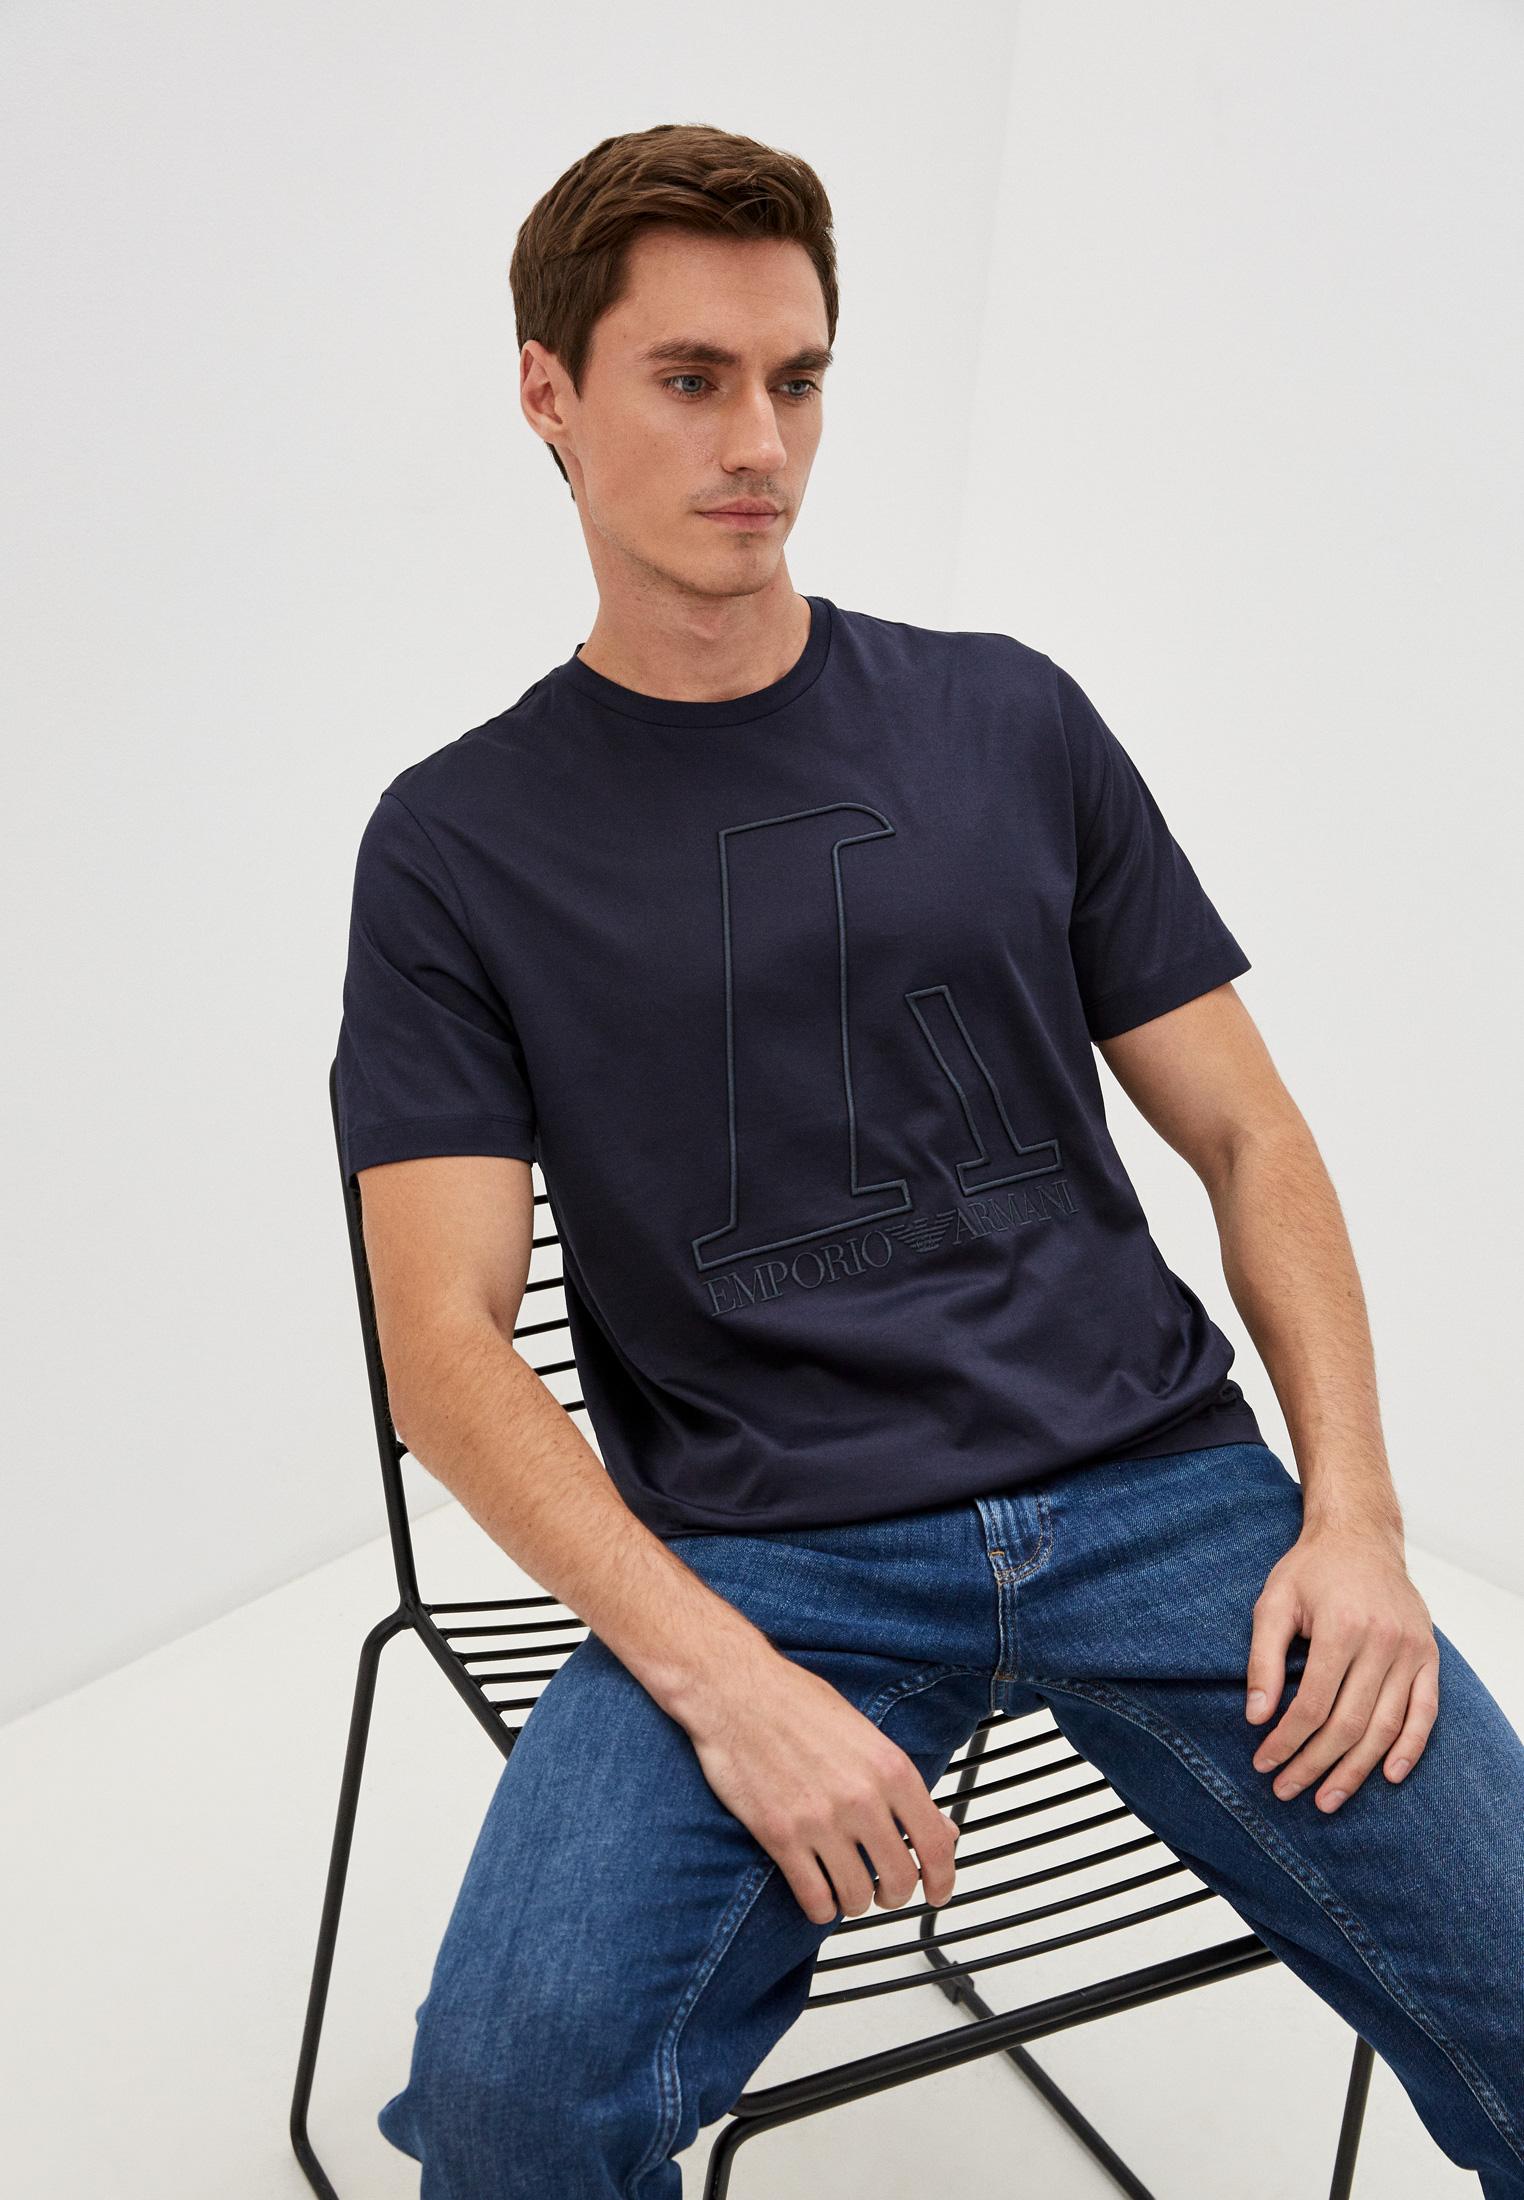 Мужская футболка Emporio Armani (Эмпорио Армани) 6K1T6R 1JQ3Z